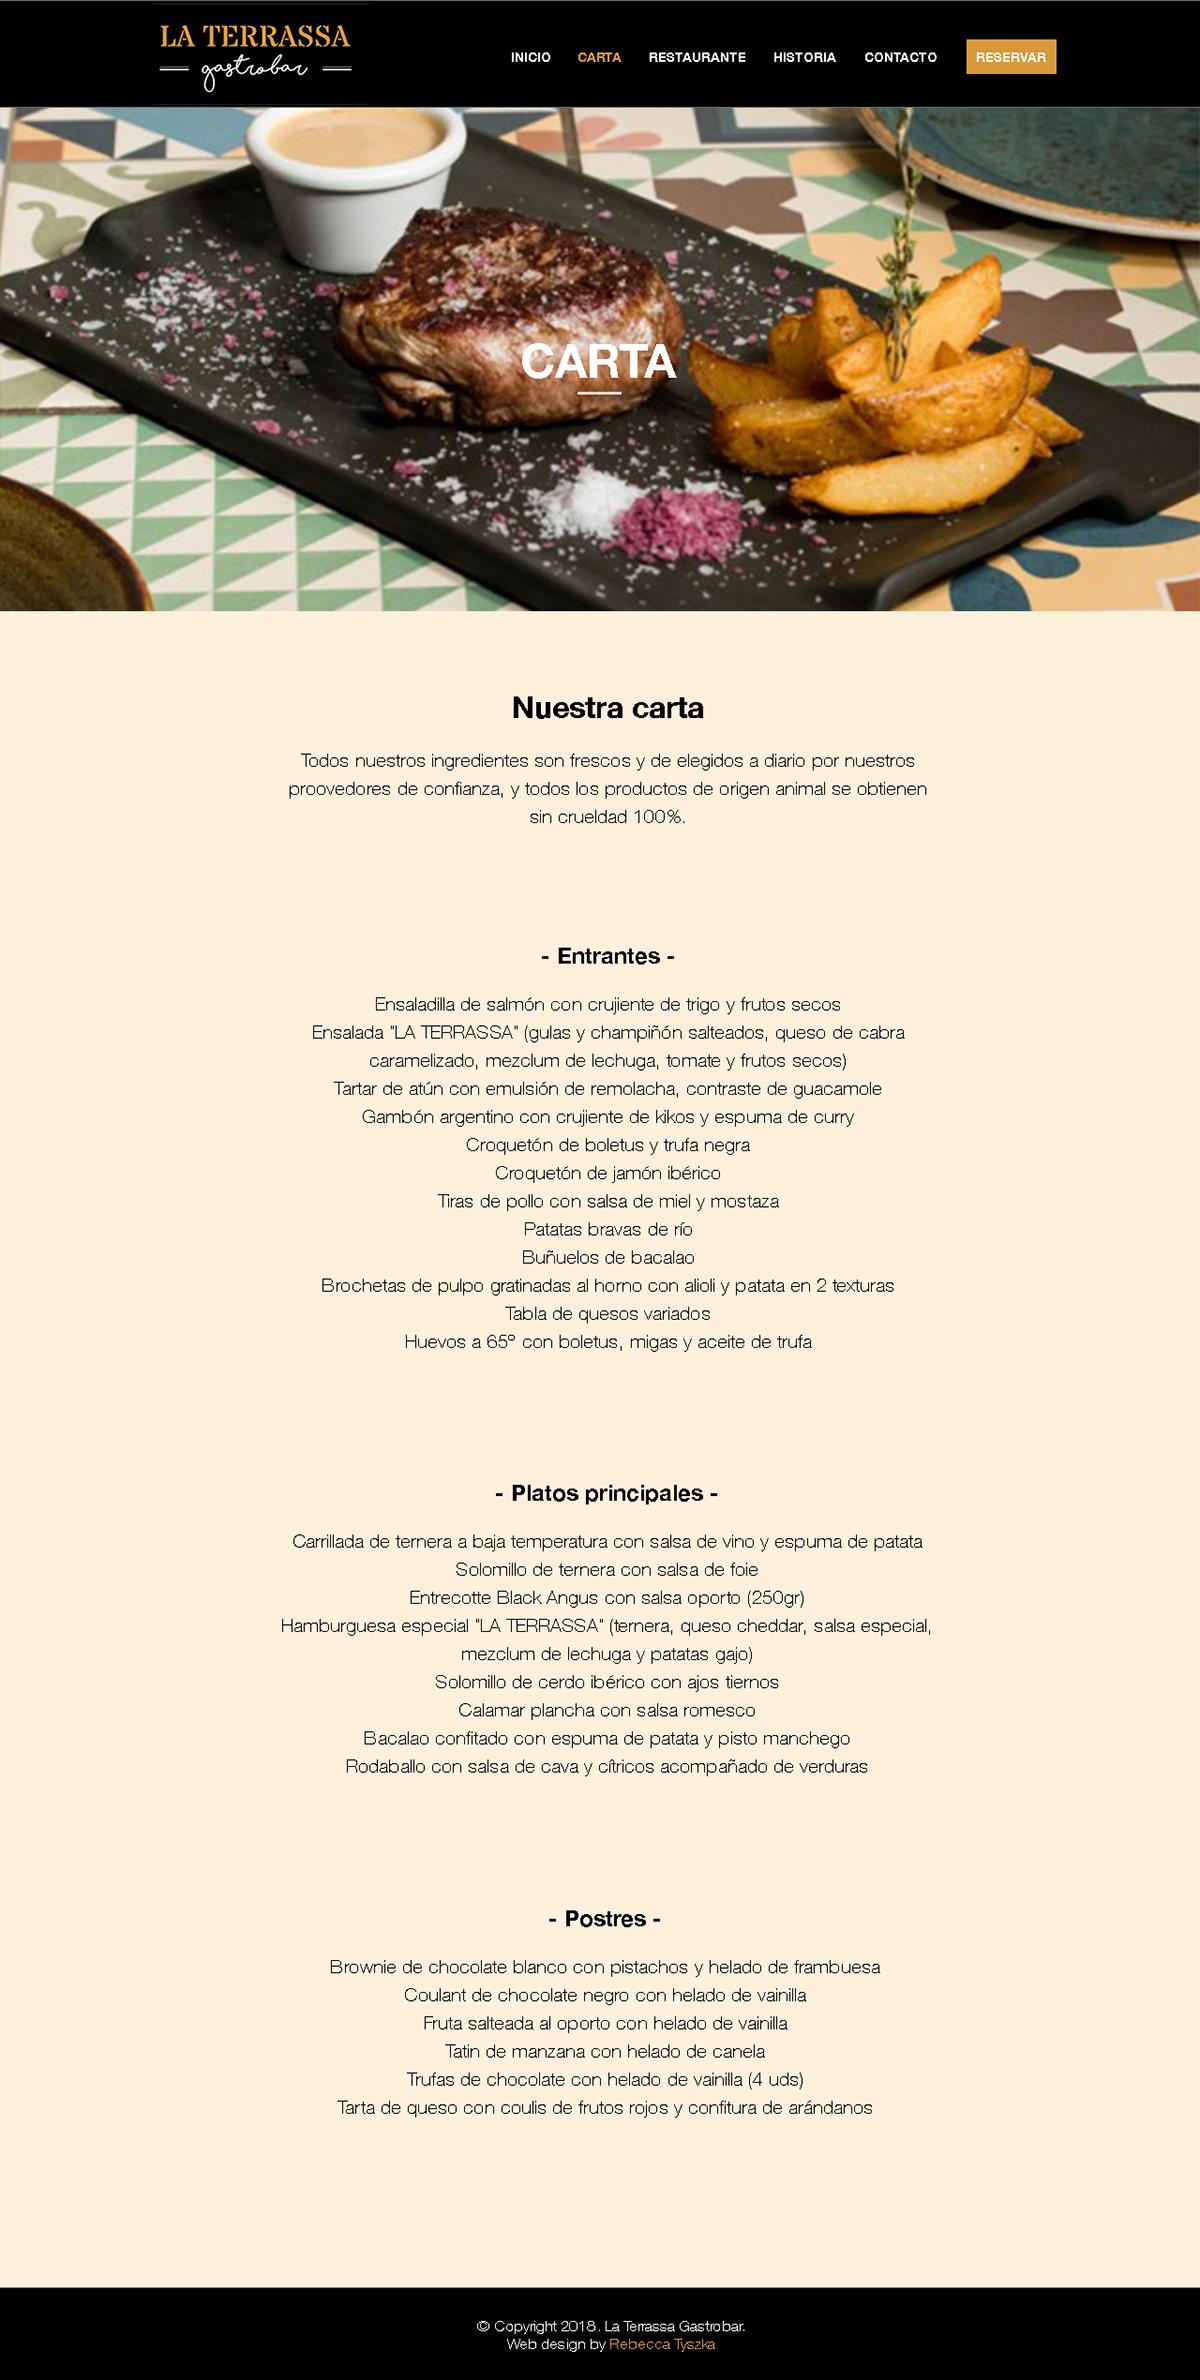 La Terrassa Gastrobar | Plantilla página web on Behance